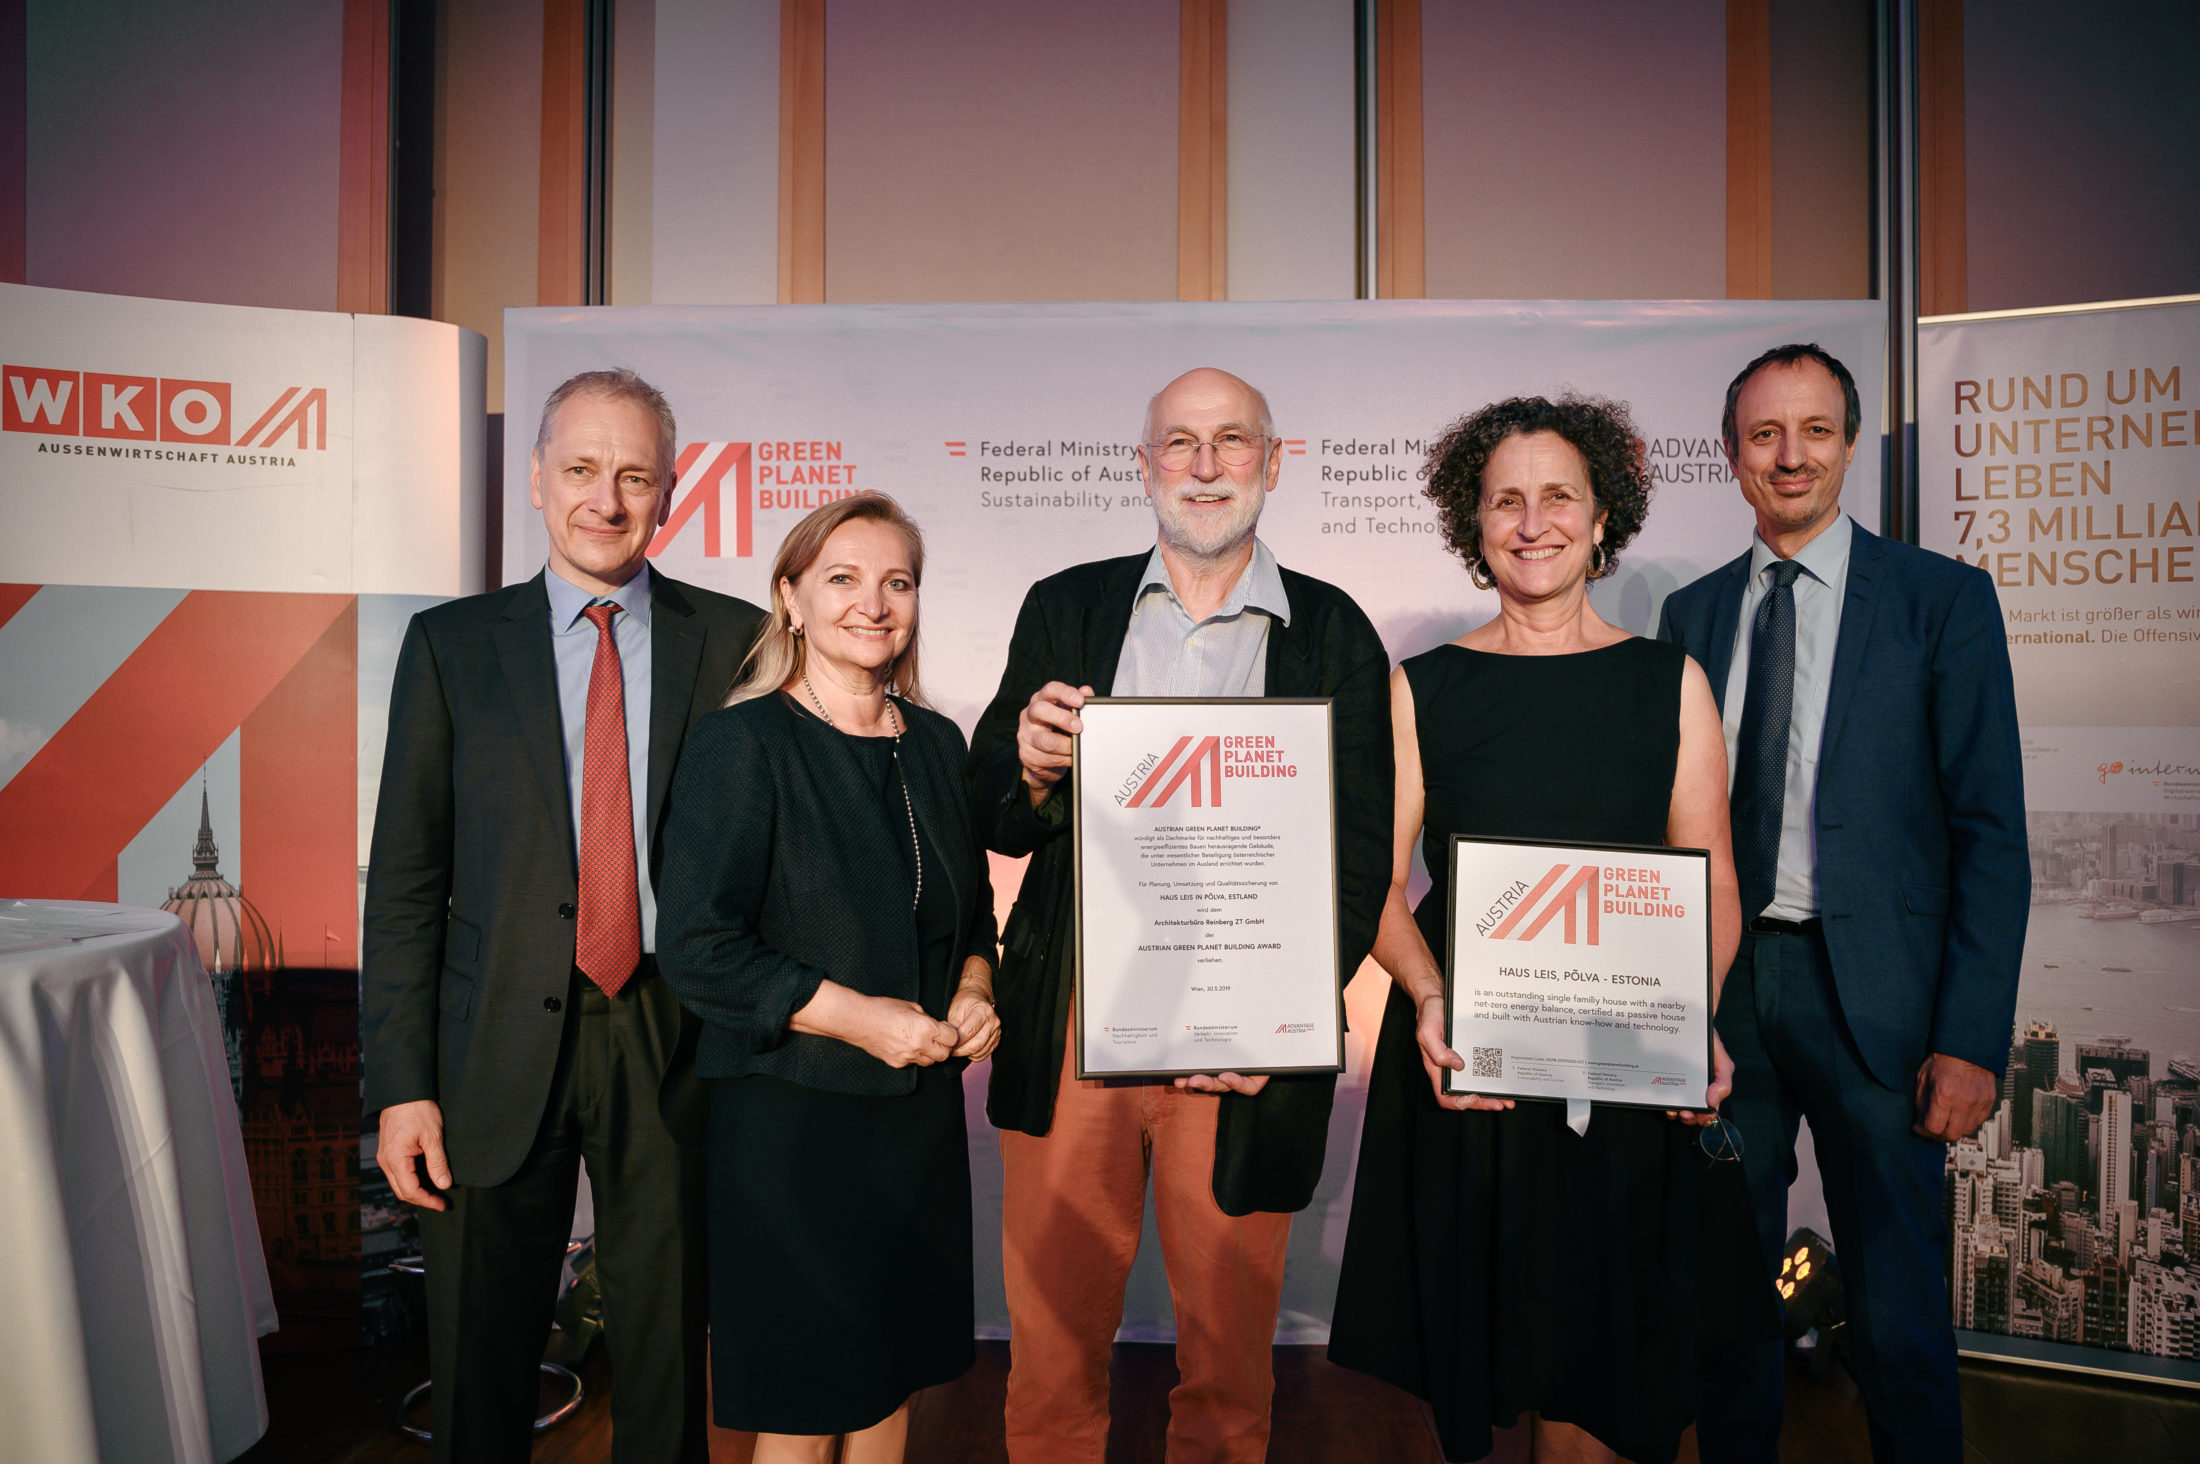 Austrian Green Planet Building Awards